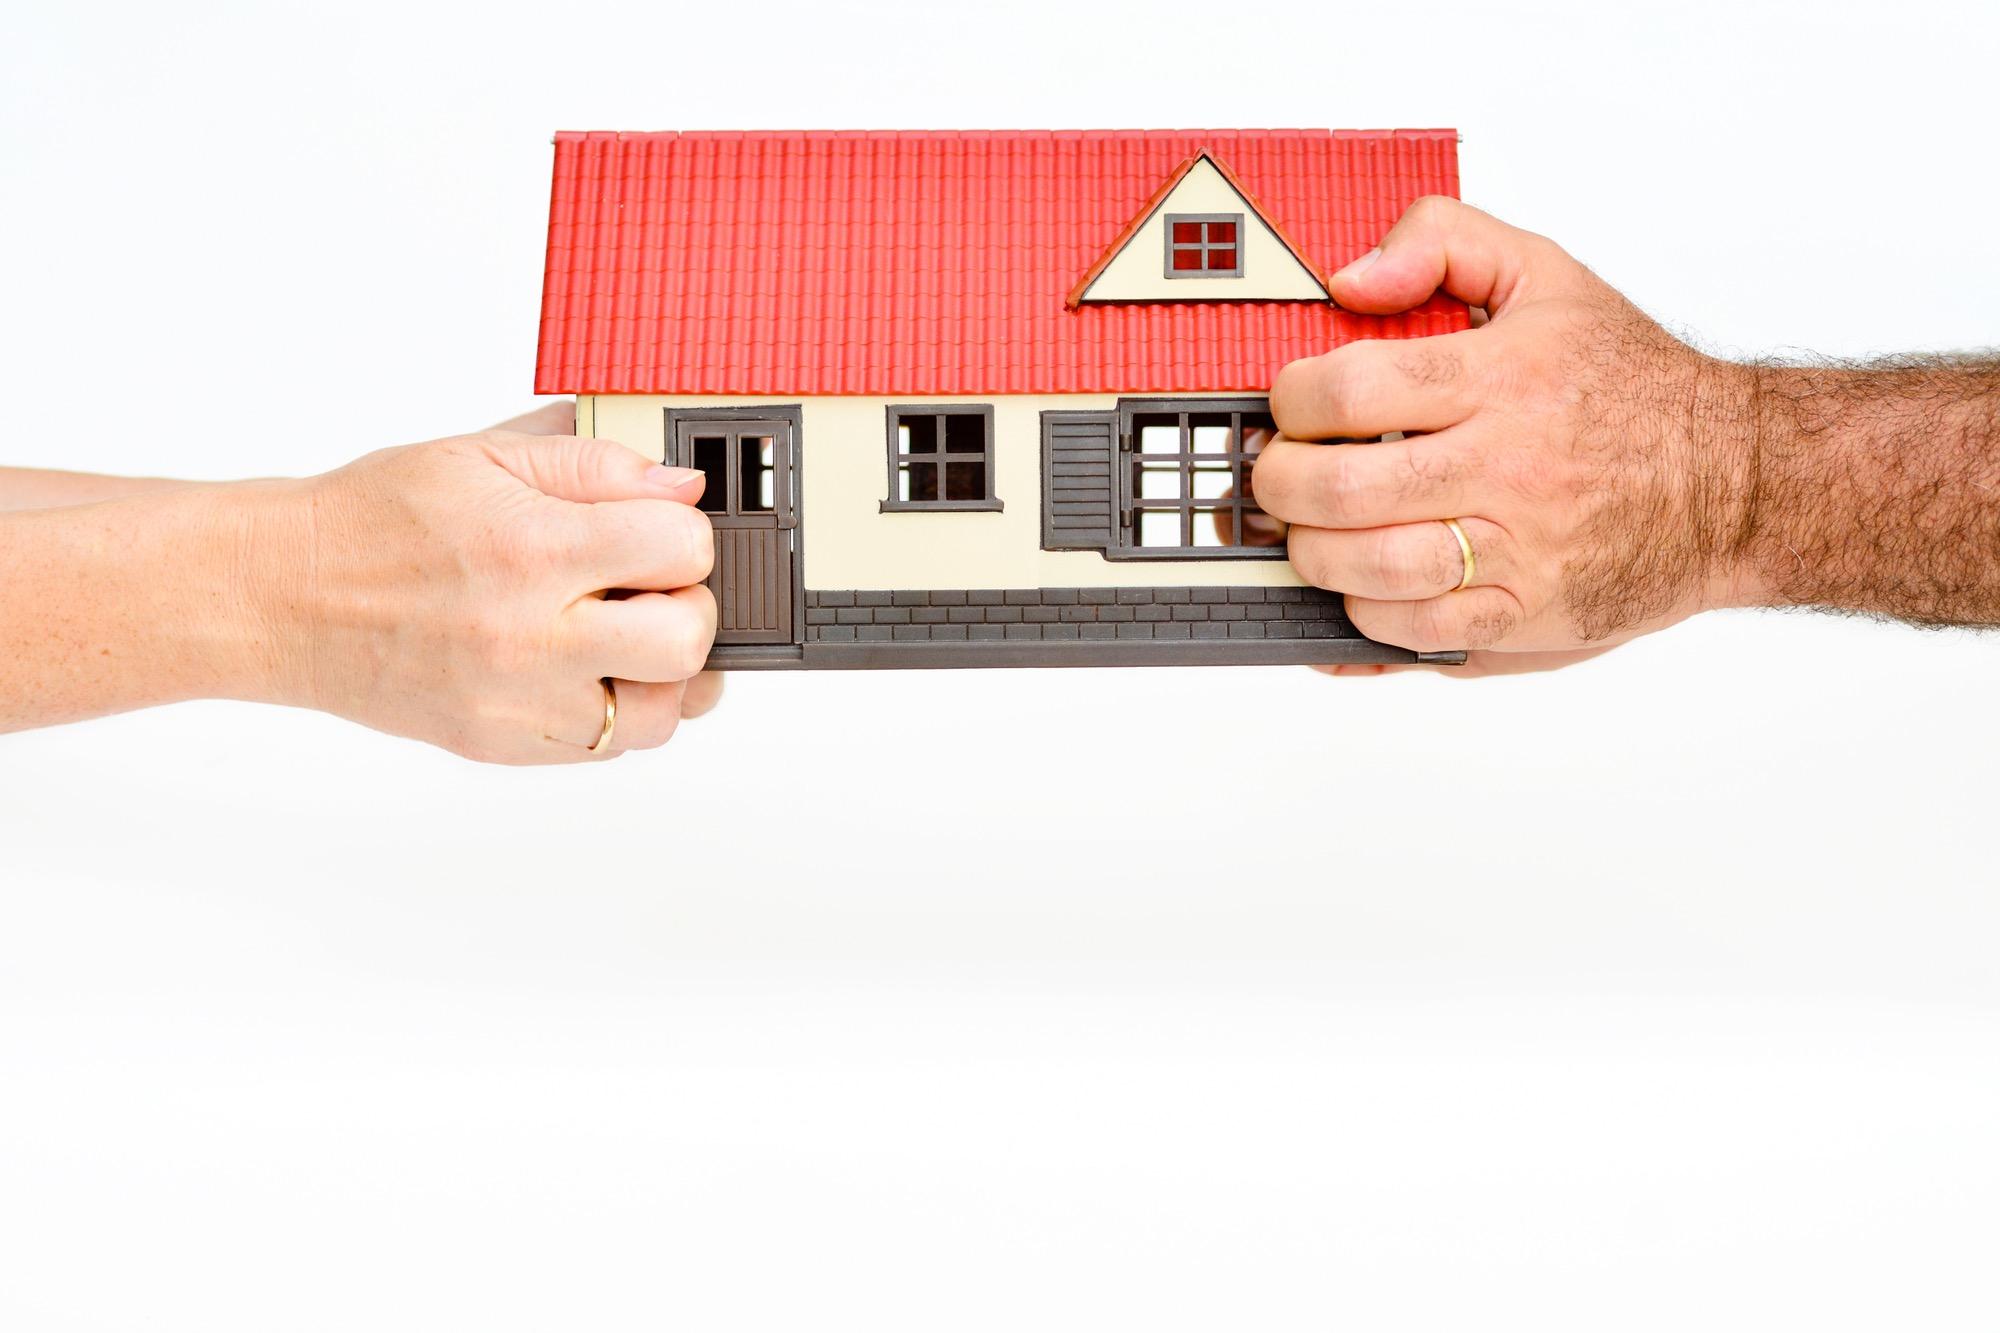 Nevada Revised Statutes >> Division of Premarital Assets During Divorce | Douglas ...